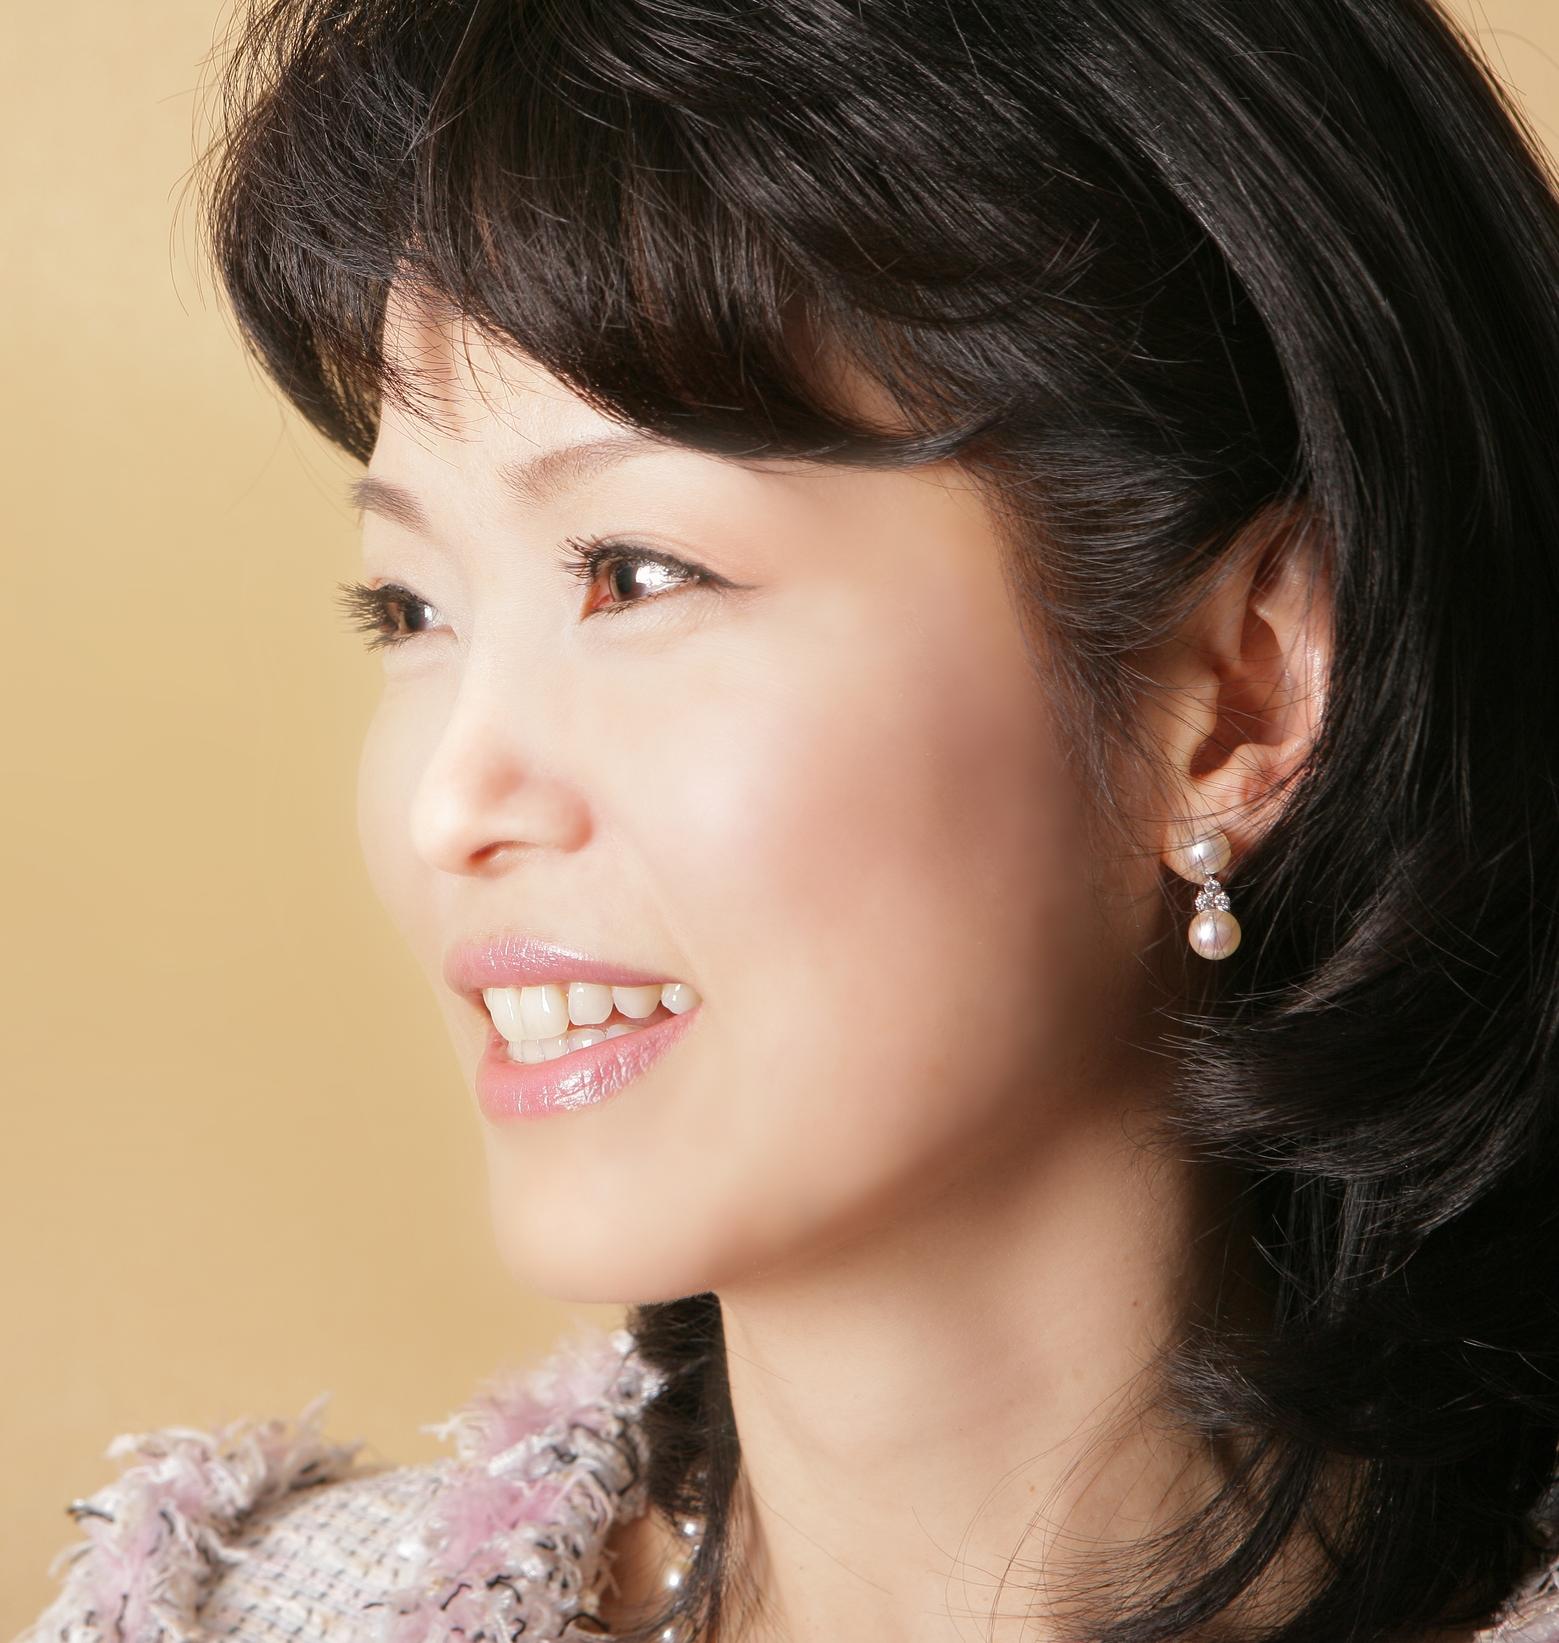 Dr. Jau-Fei Chen, Founder of E. EXCEL International